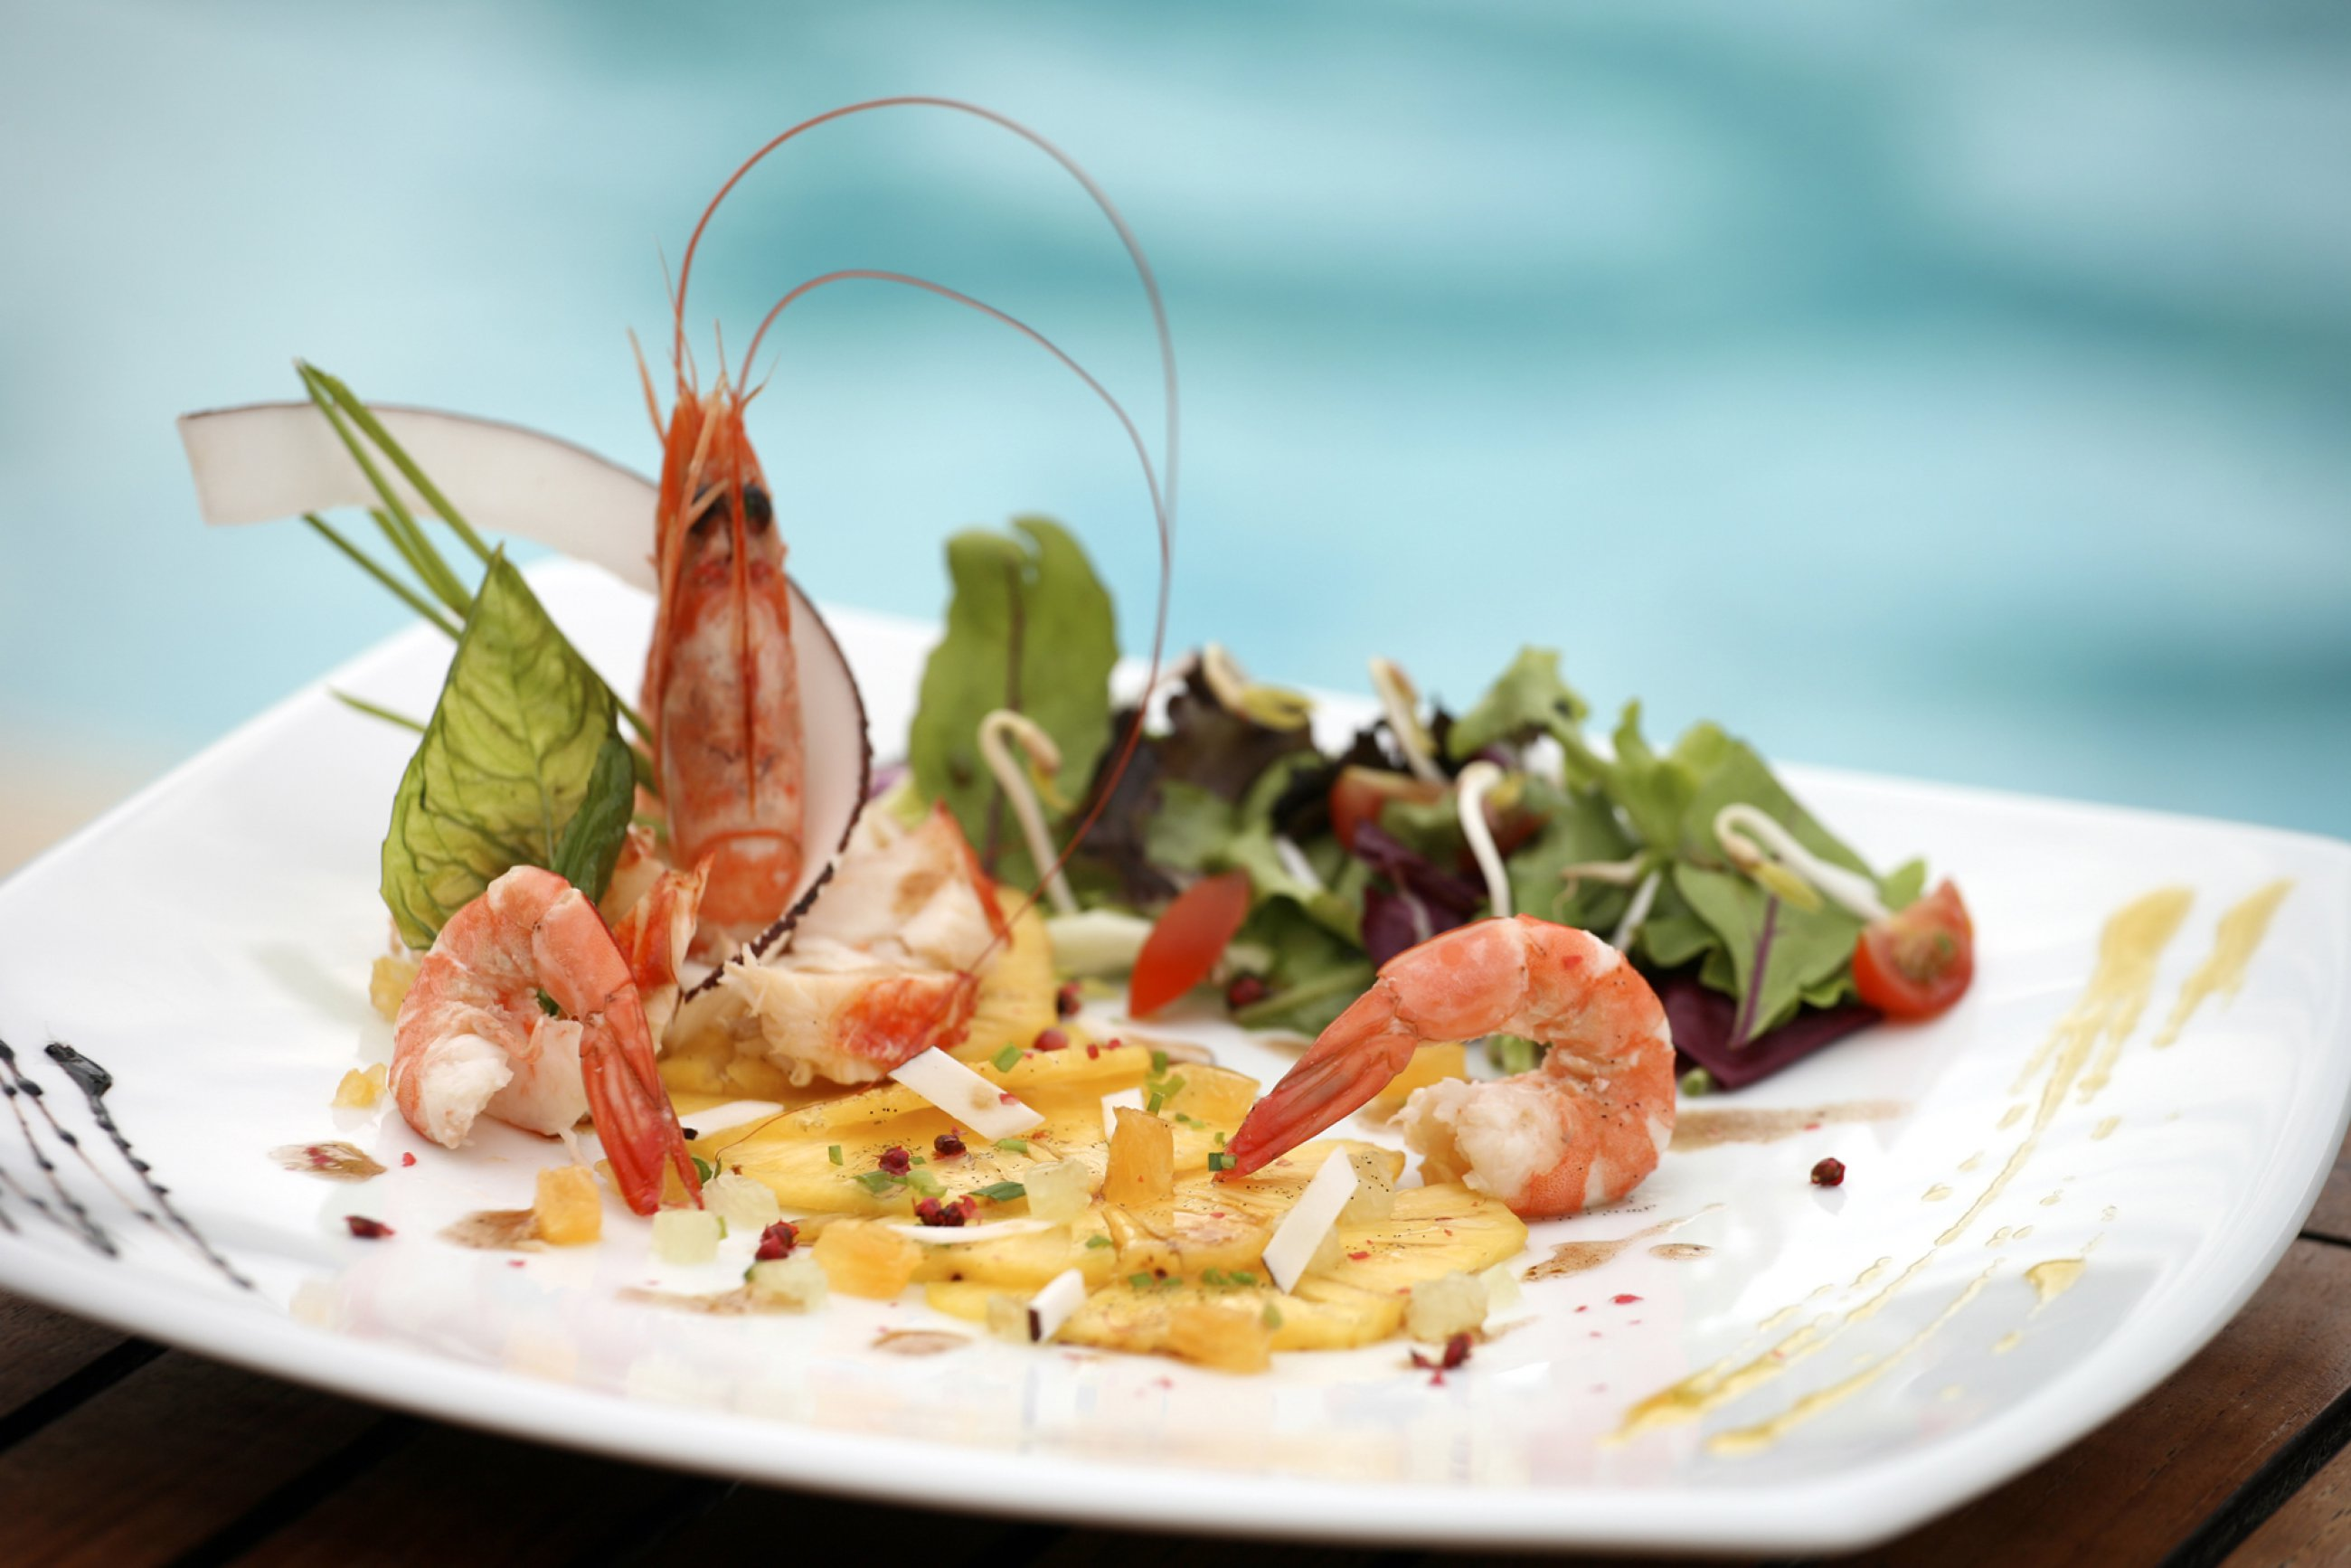 https://bubo.sk/uploads/galleries/5033/cook-island-food18.jpg